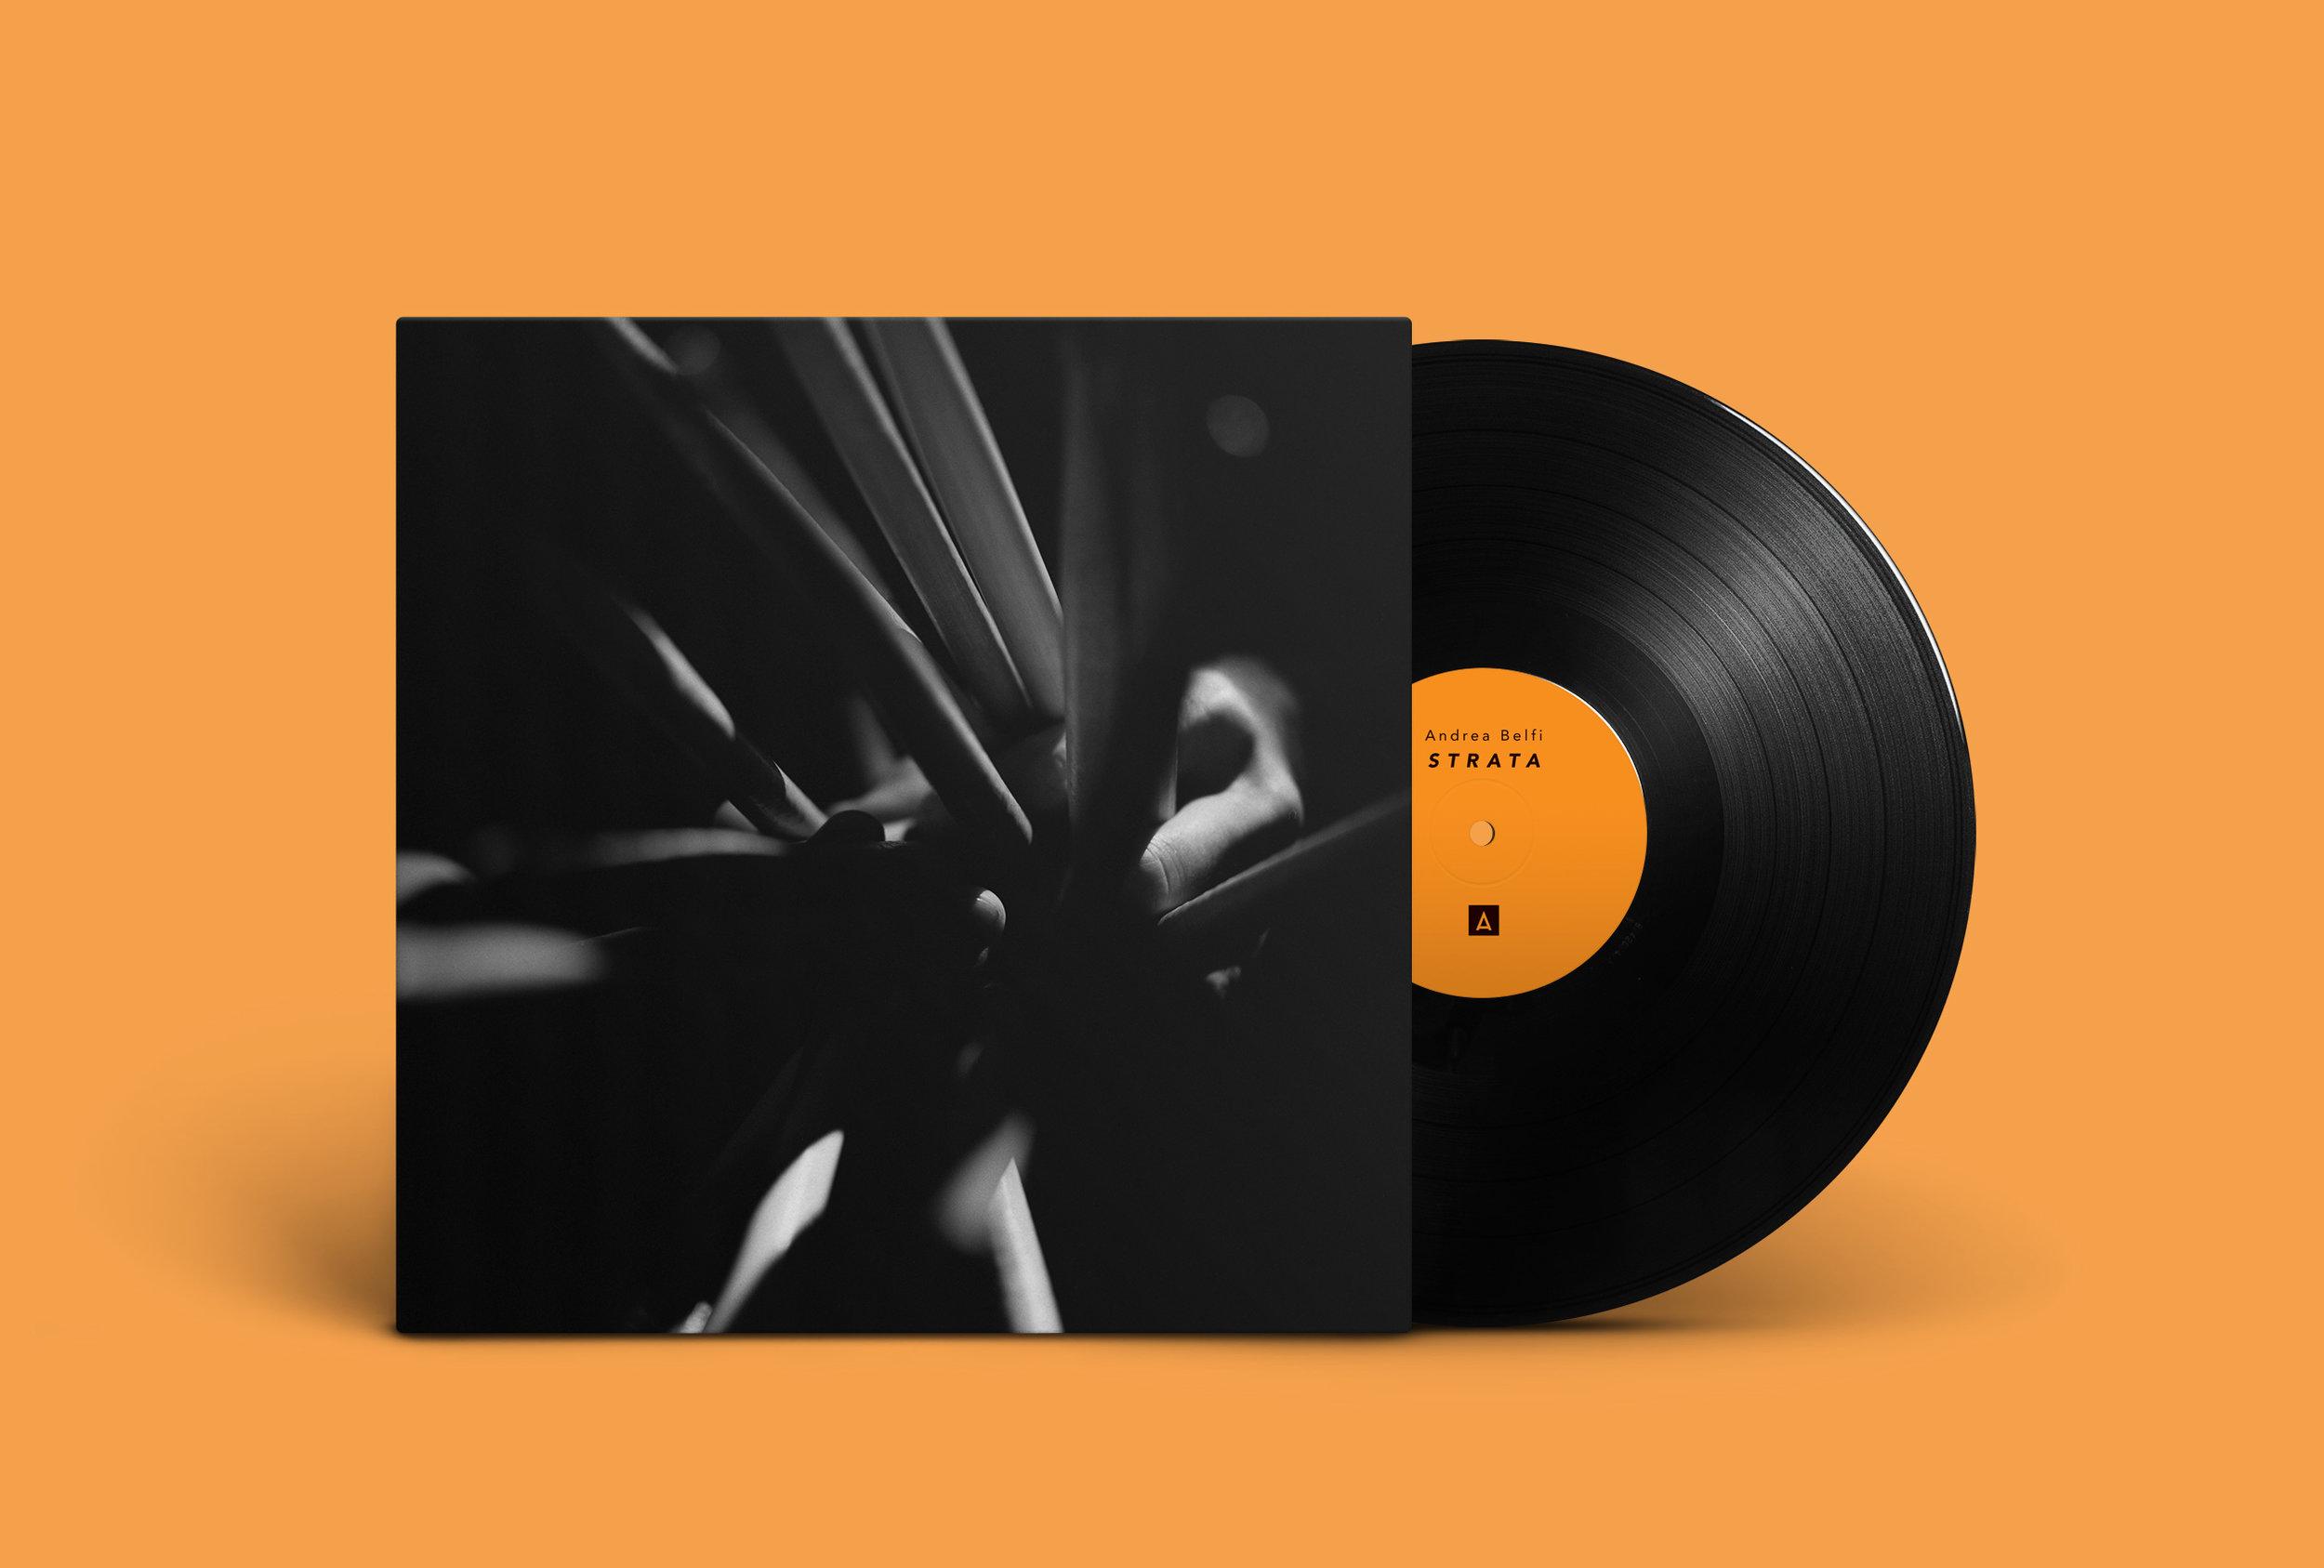 Andrea-Belfi_STRATA_vinyl-mock-up.jpg